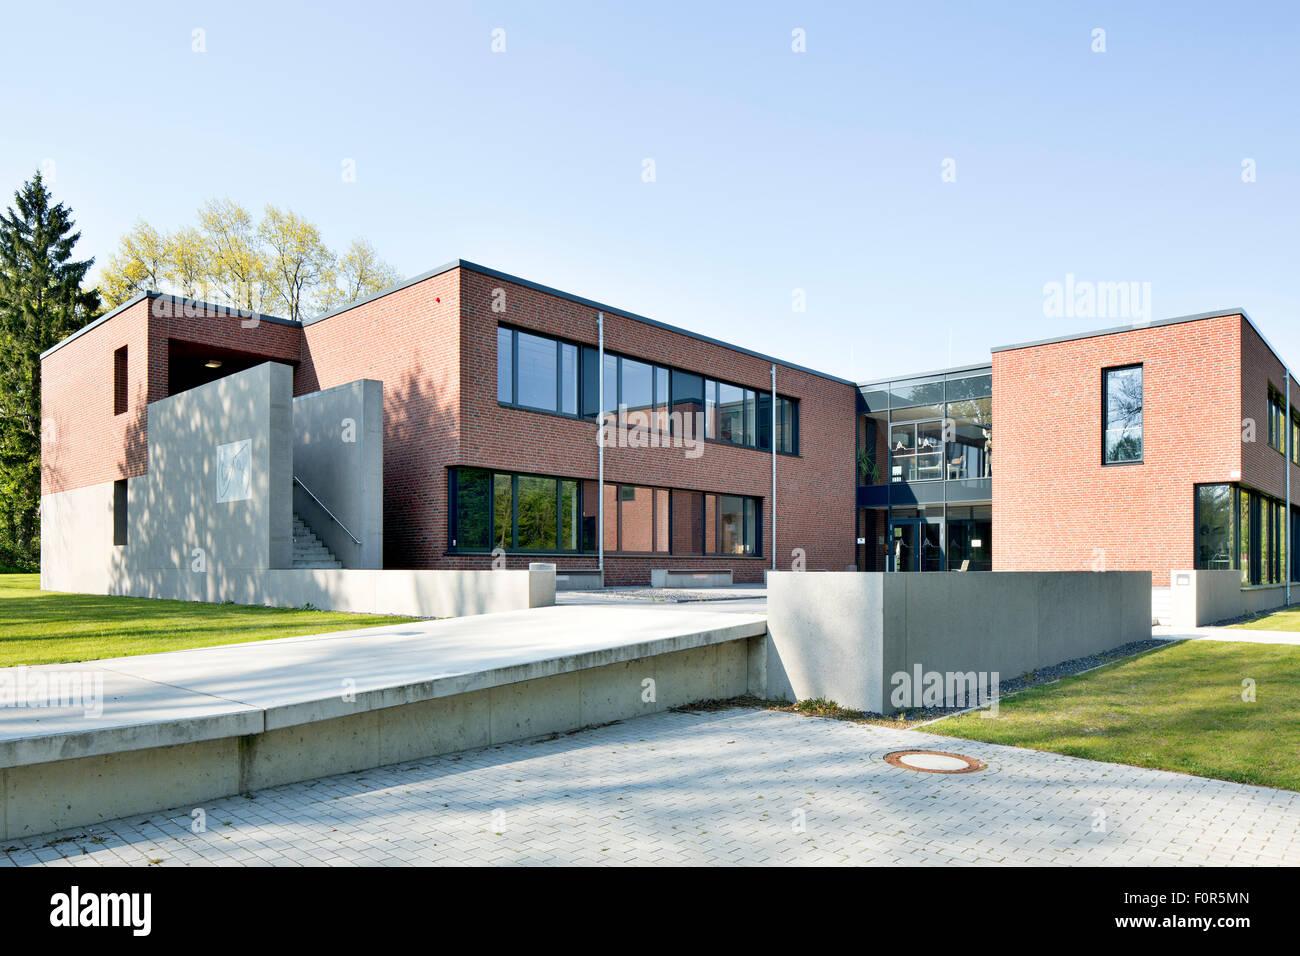 Landschulheim Hamm-Heessen, educational building, expansion, Hamm, Westphalia, North Rhine-Westphalia, Germany - Stock Image